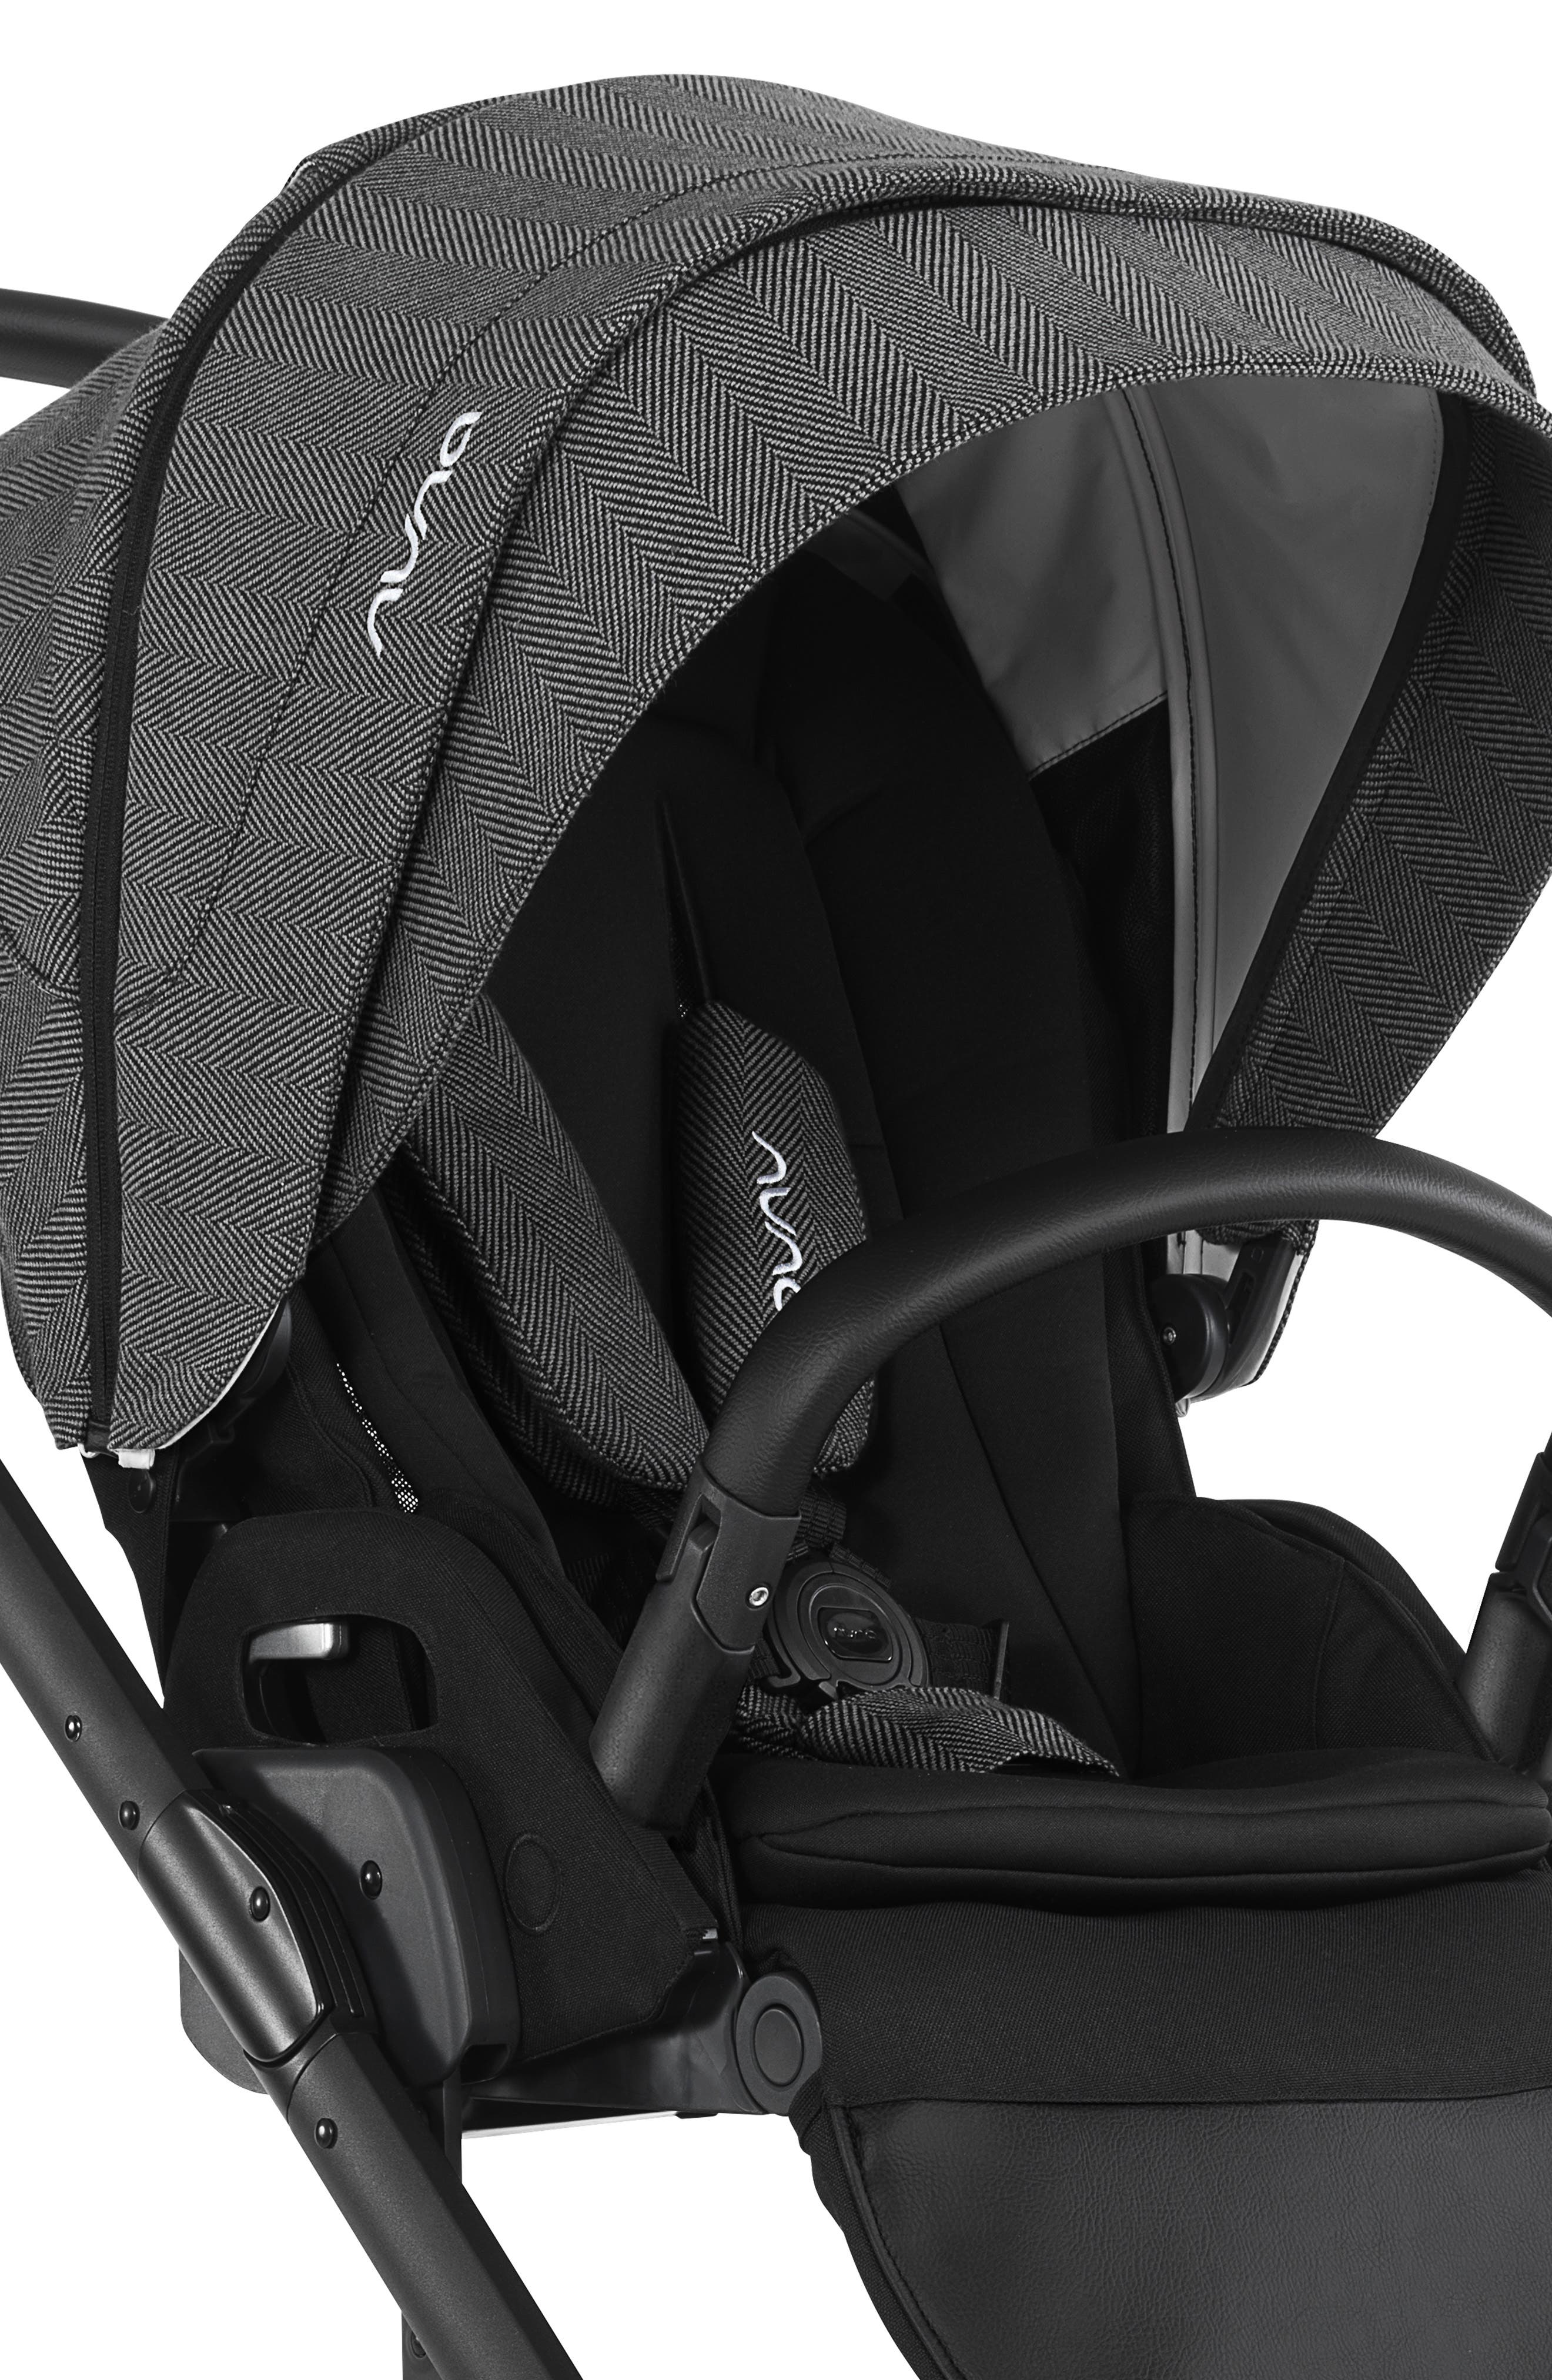 2019 MIXX<sup>™</sup> Stroller & PIPA<sup>™</sup> Lite LX Infant Car Seat Set Travel System,                             Alternate thumbnail 5, color,                             VERONA CAVIAR